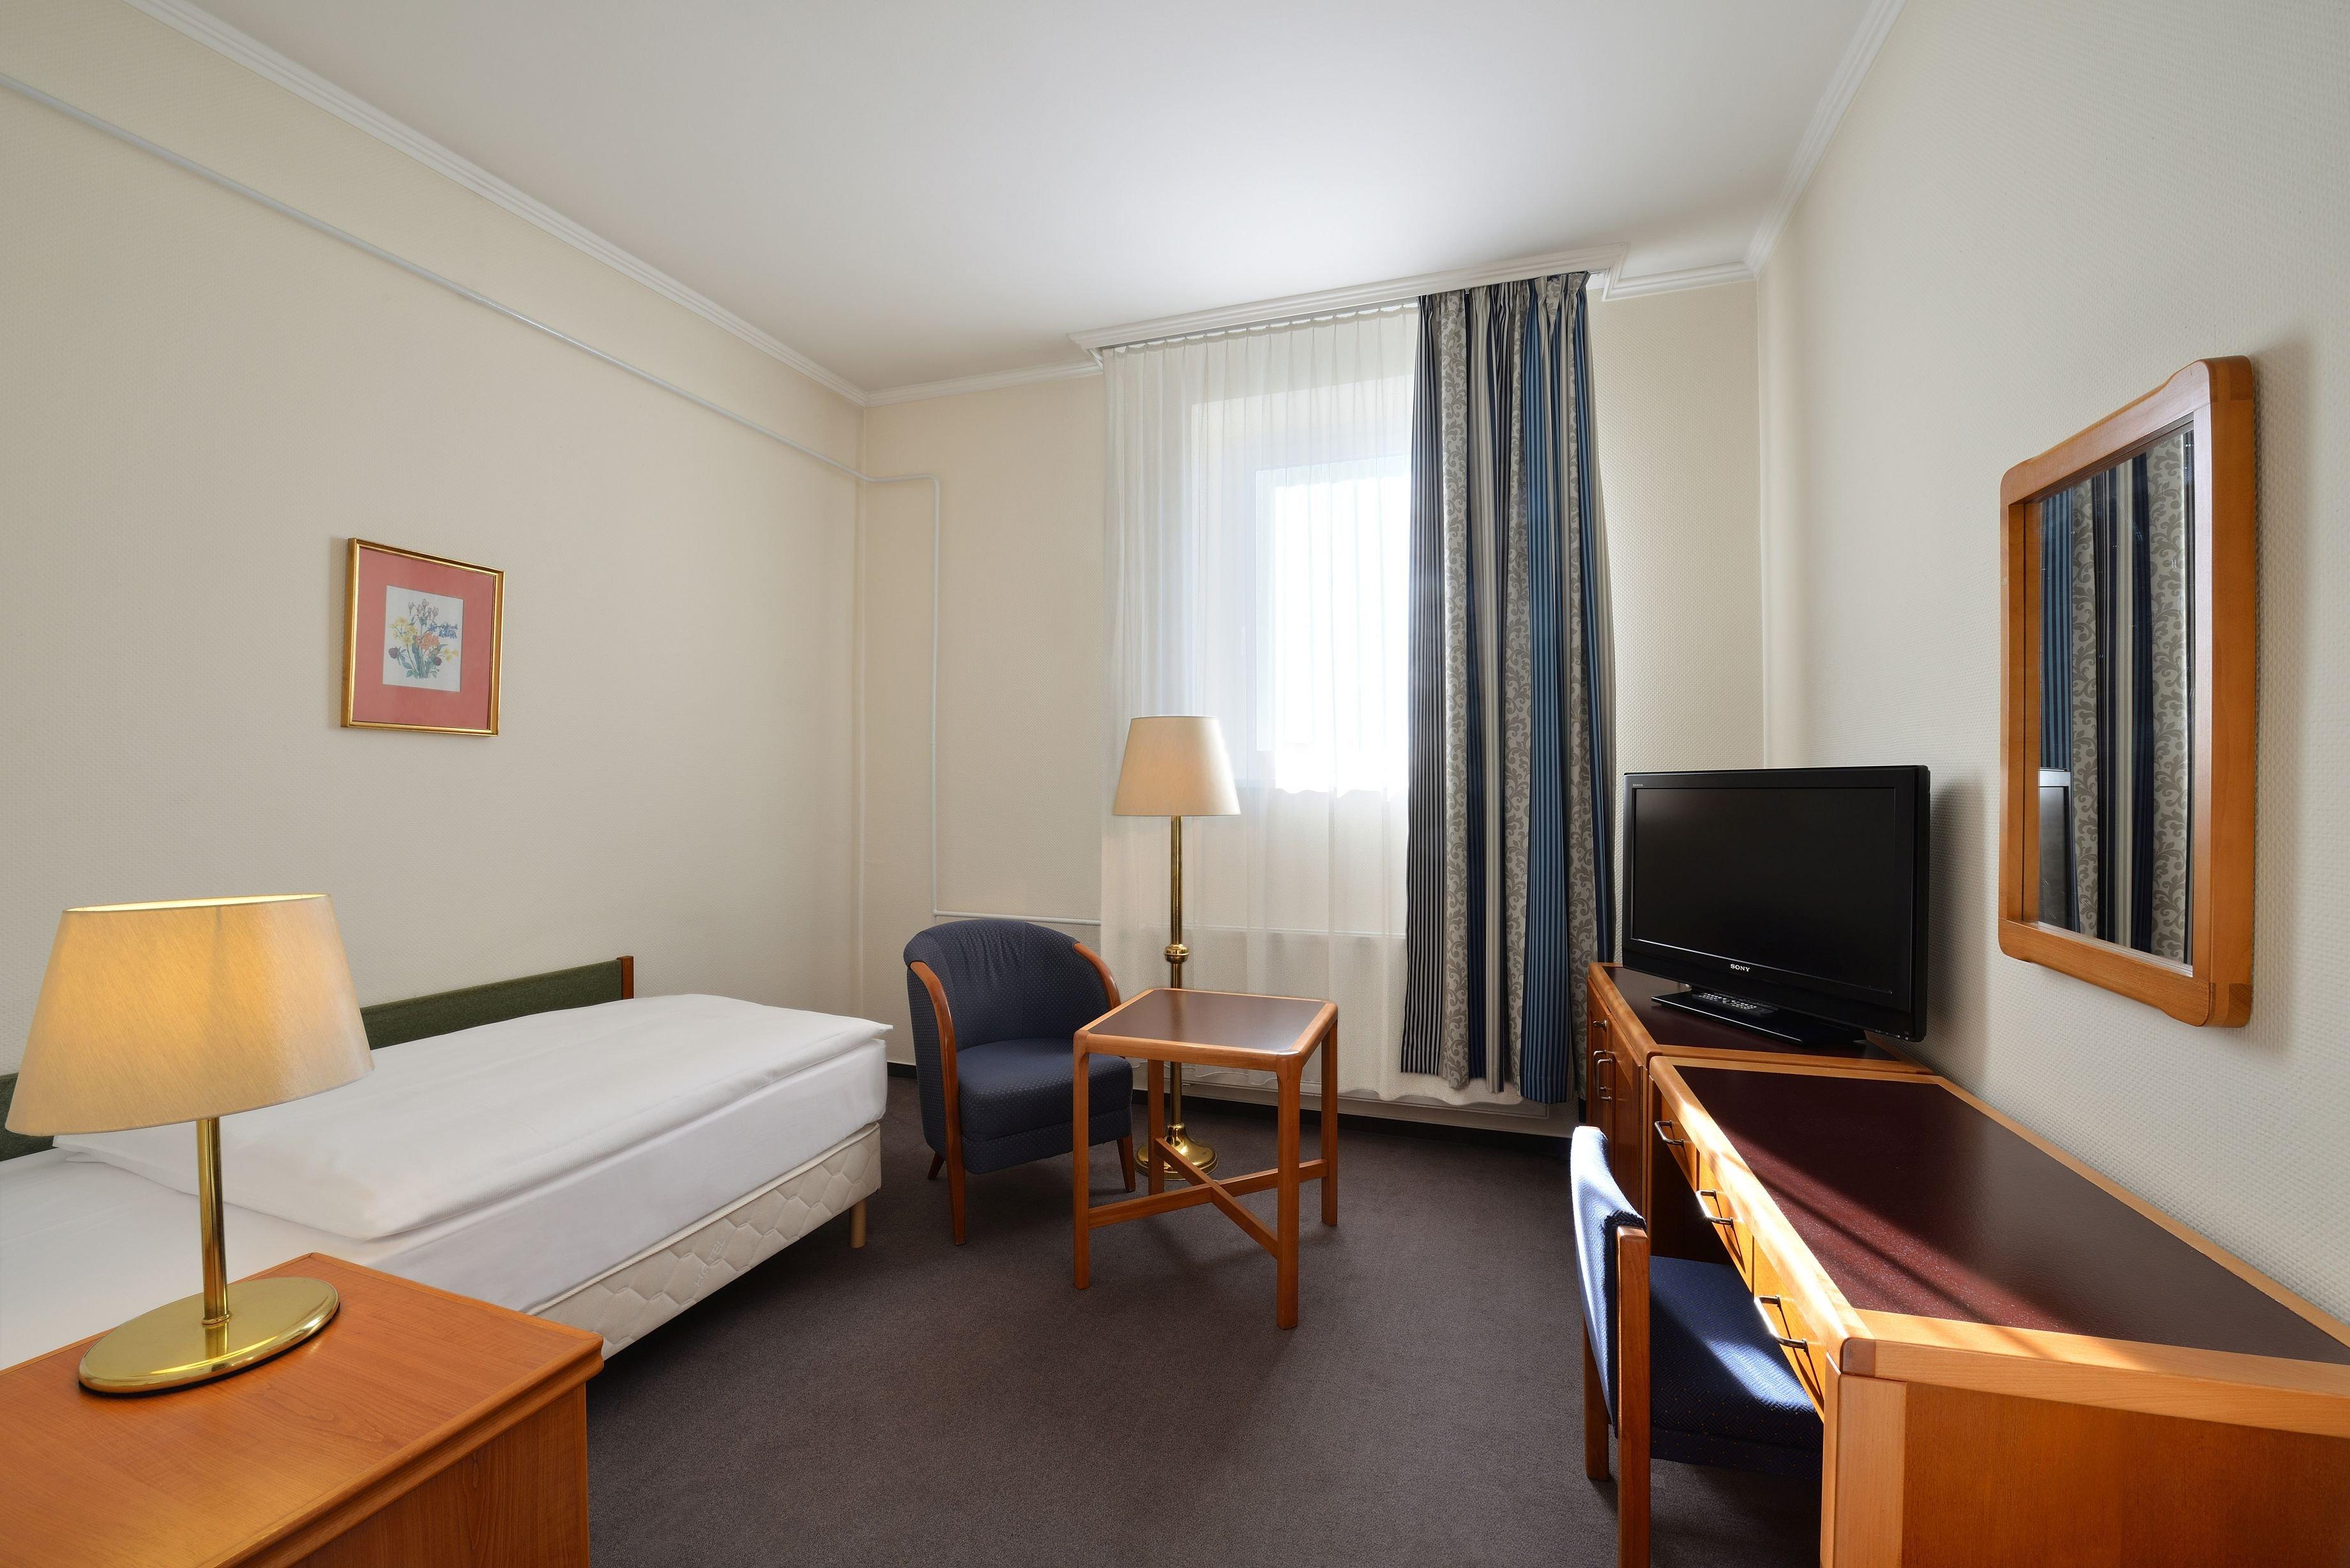 Štandardná jednolôžková izba